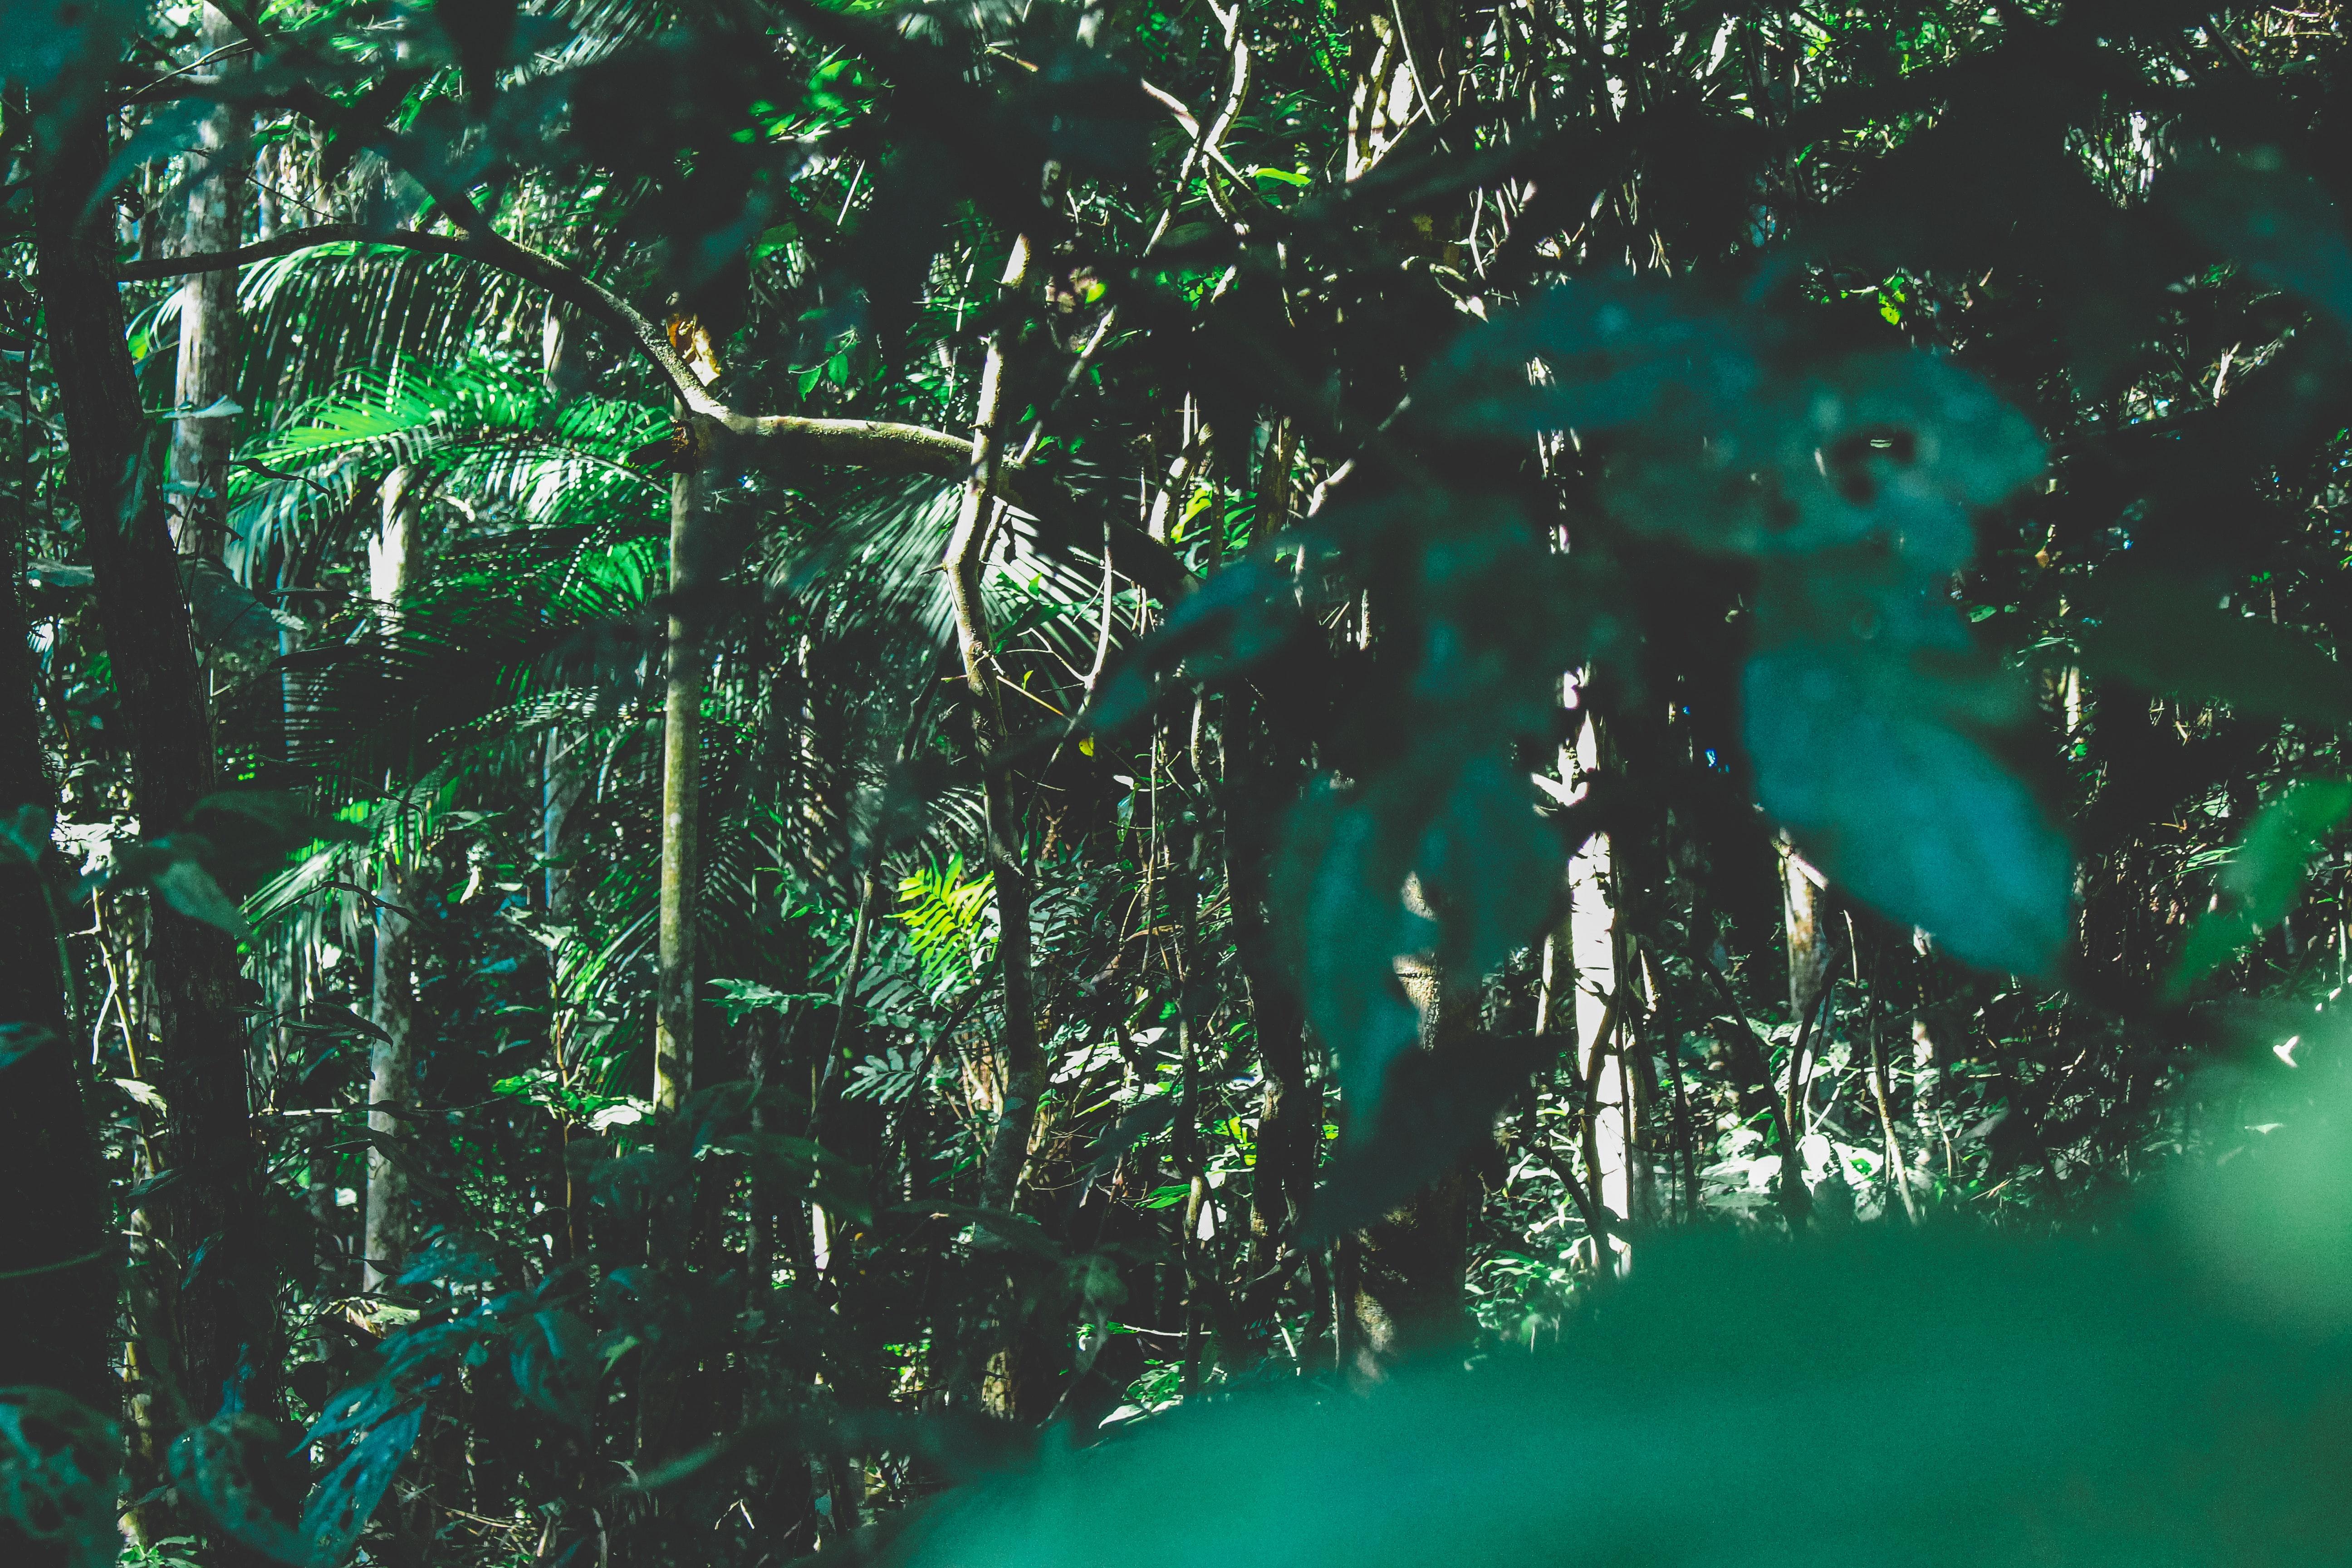 branches-brazil-environment-1225236.jpg